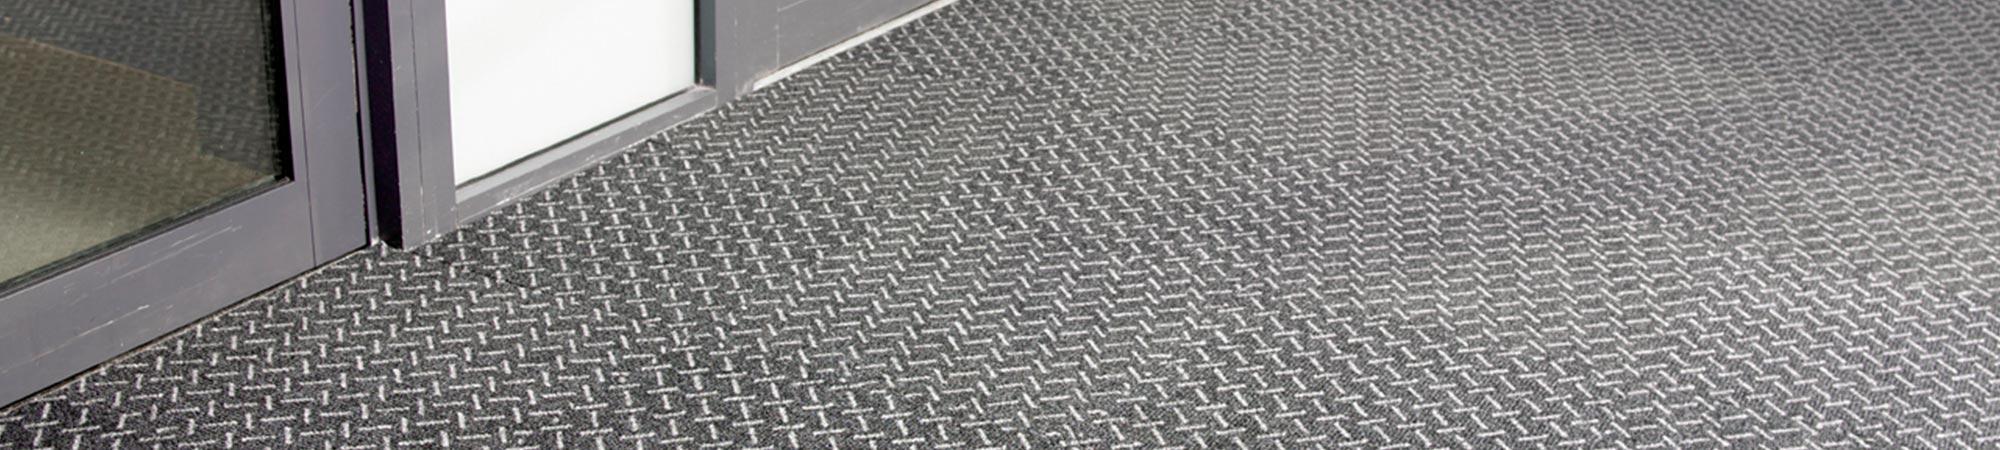 Sticks & Stones | Heckmondwike FB | Commercial Carpets | Featured Image